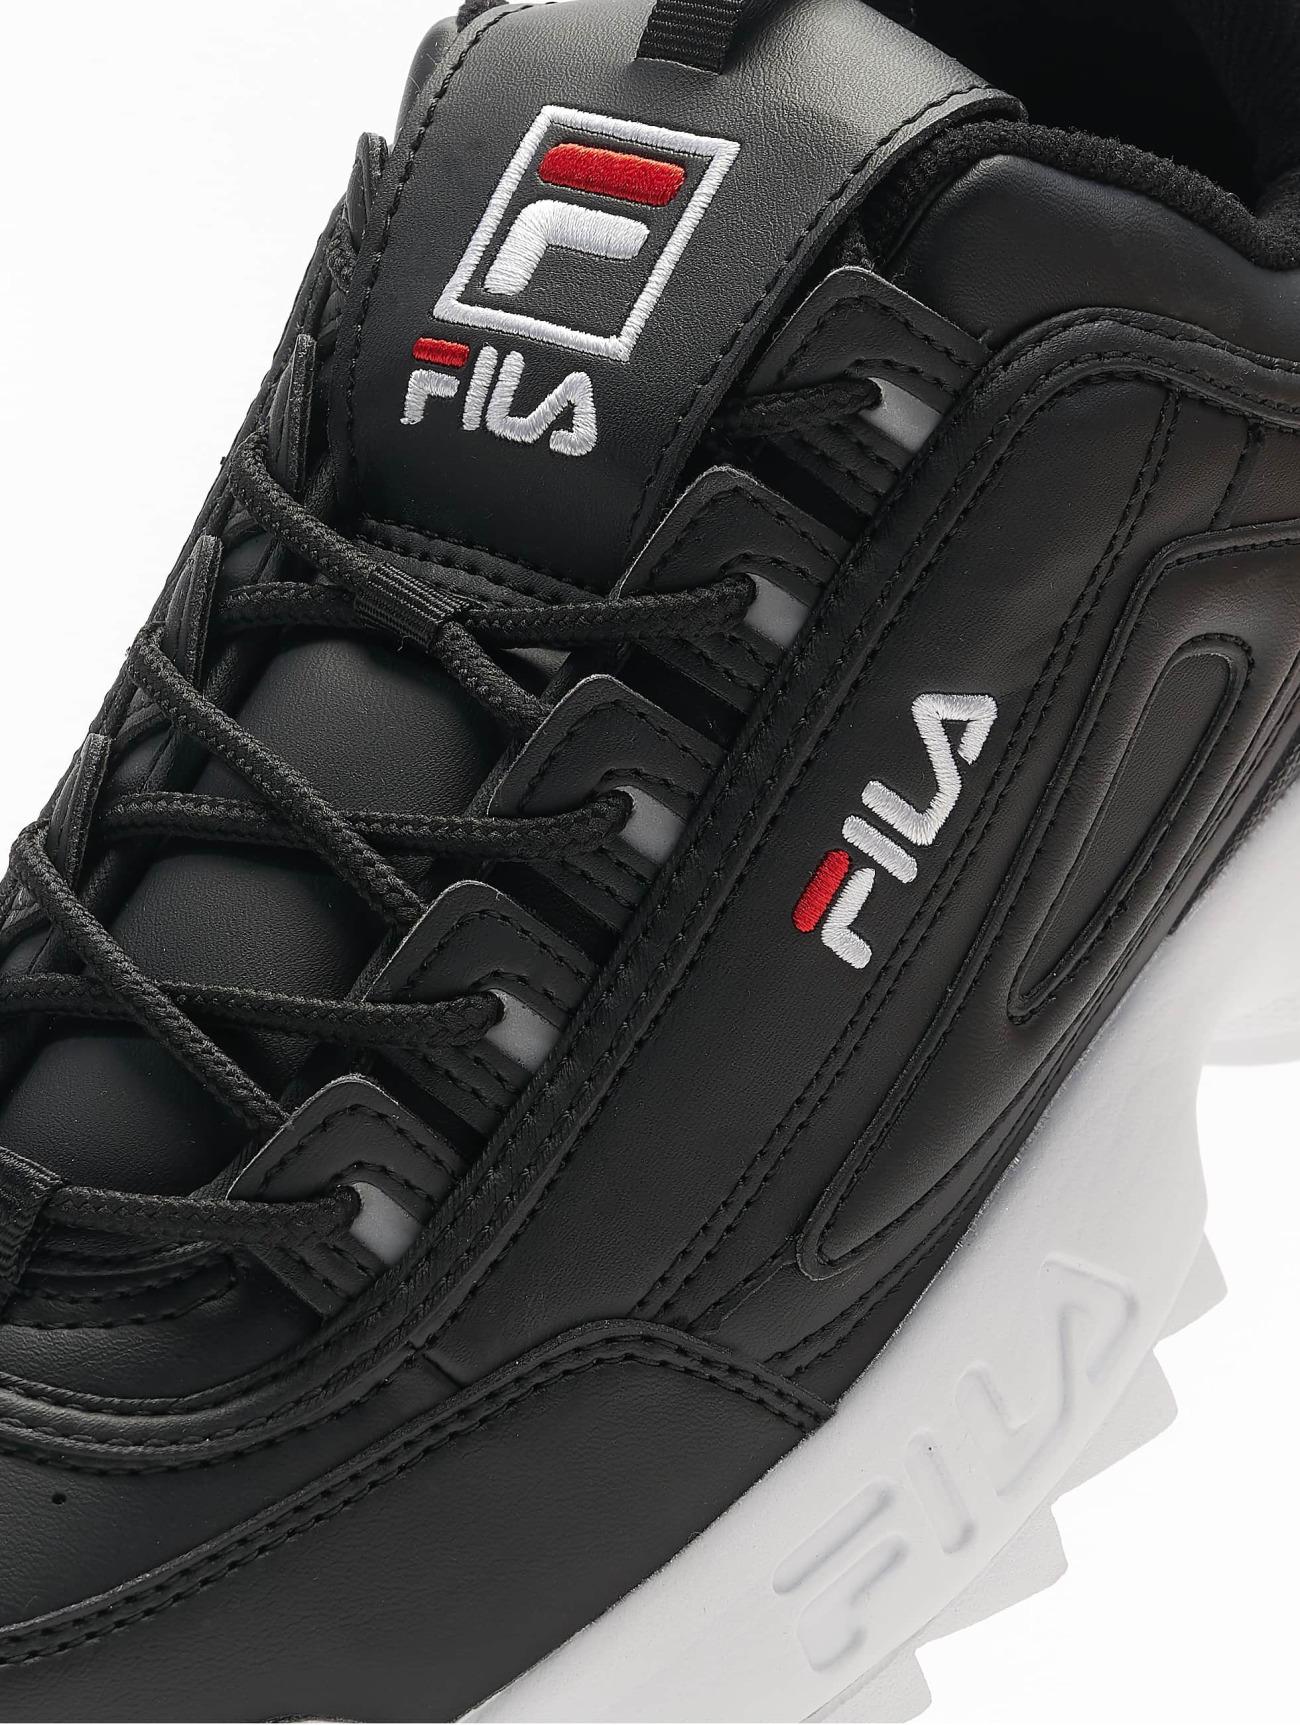 FILA Heritage Disruptor noir Homme Baskets 509610 Homme Chaussures